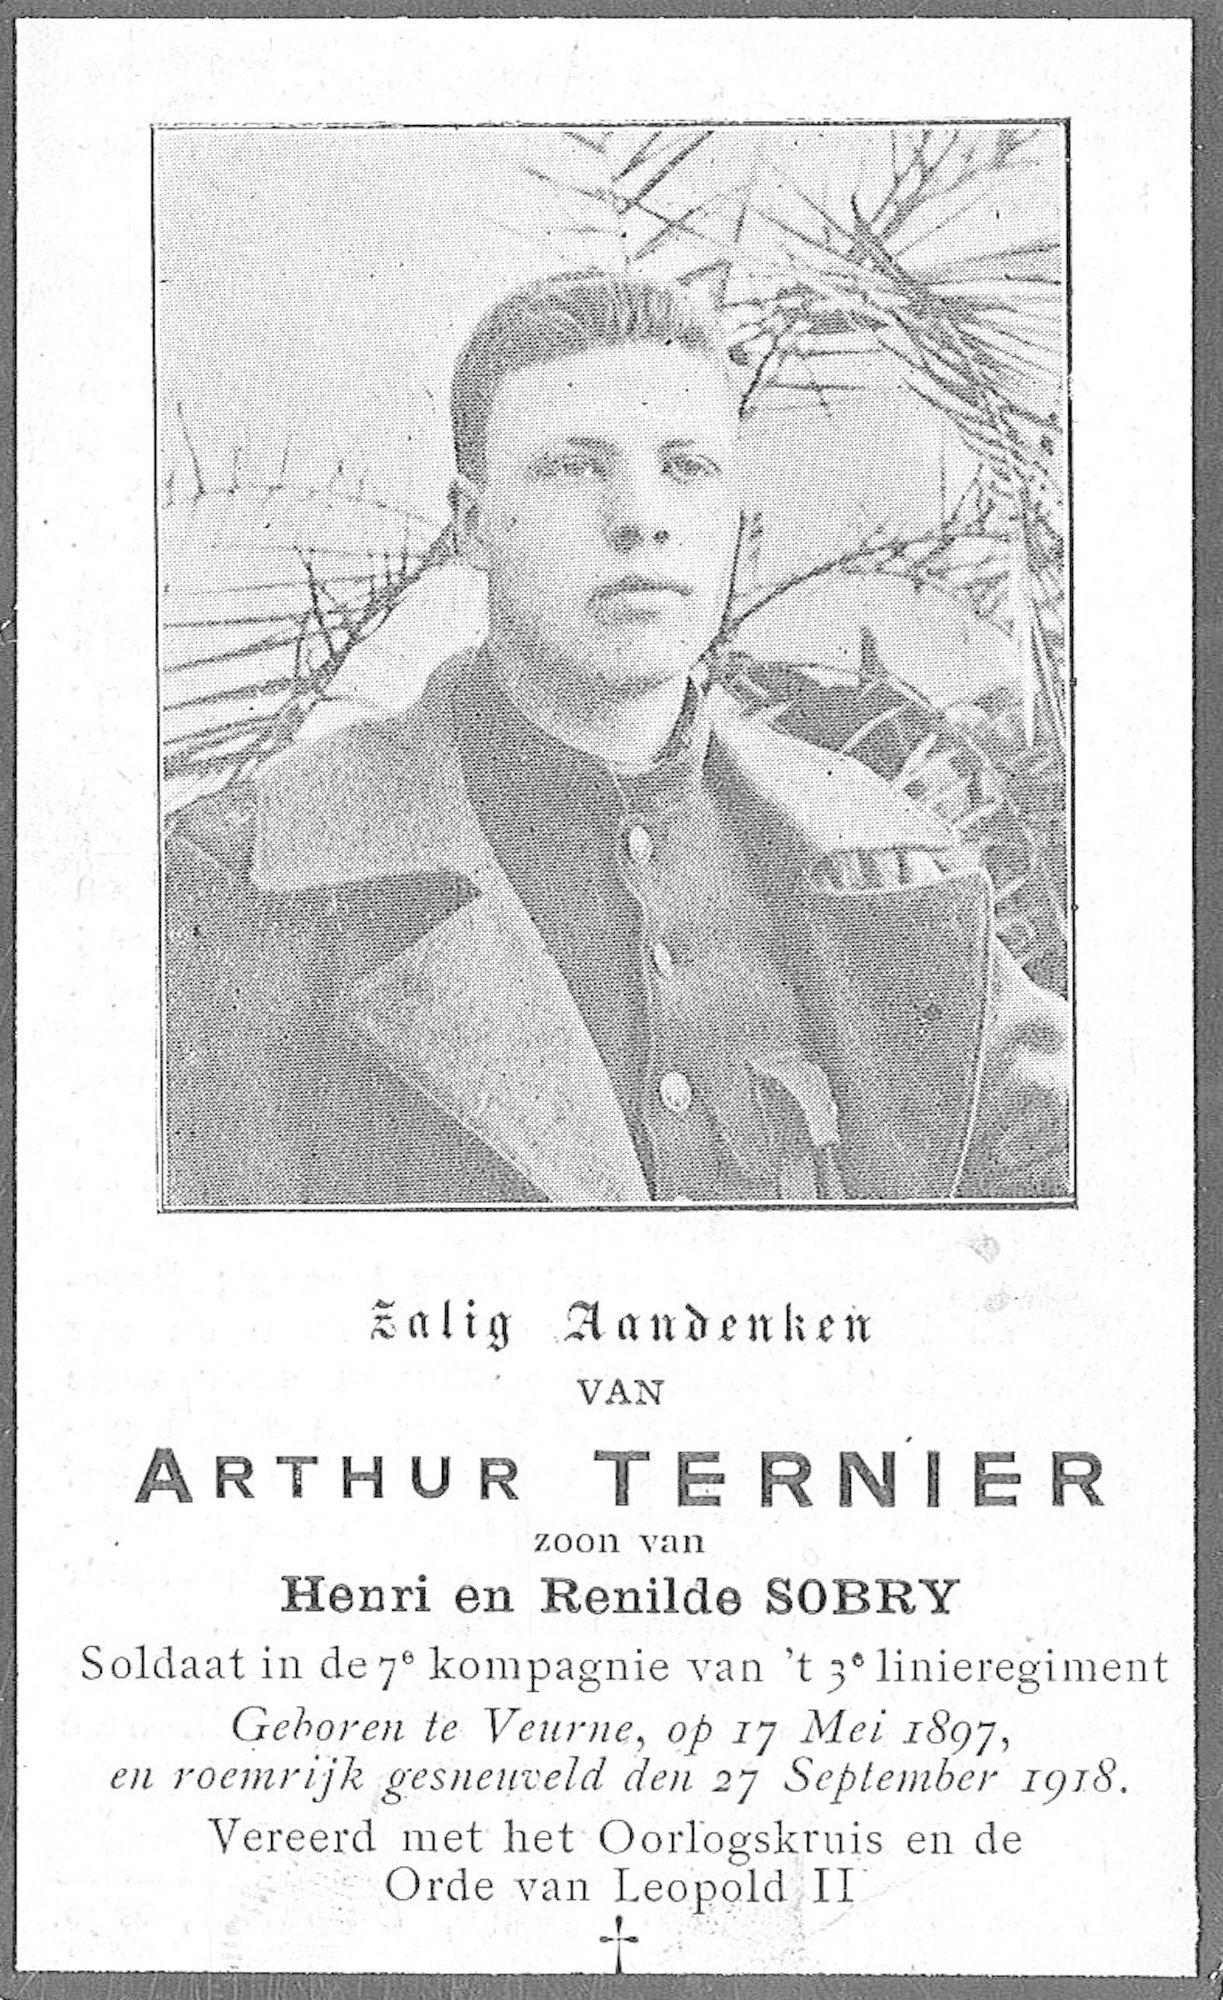 Arthur Ternier